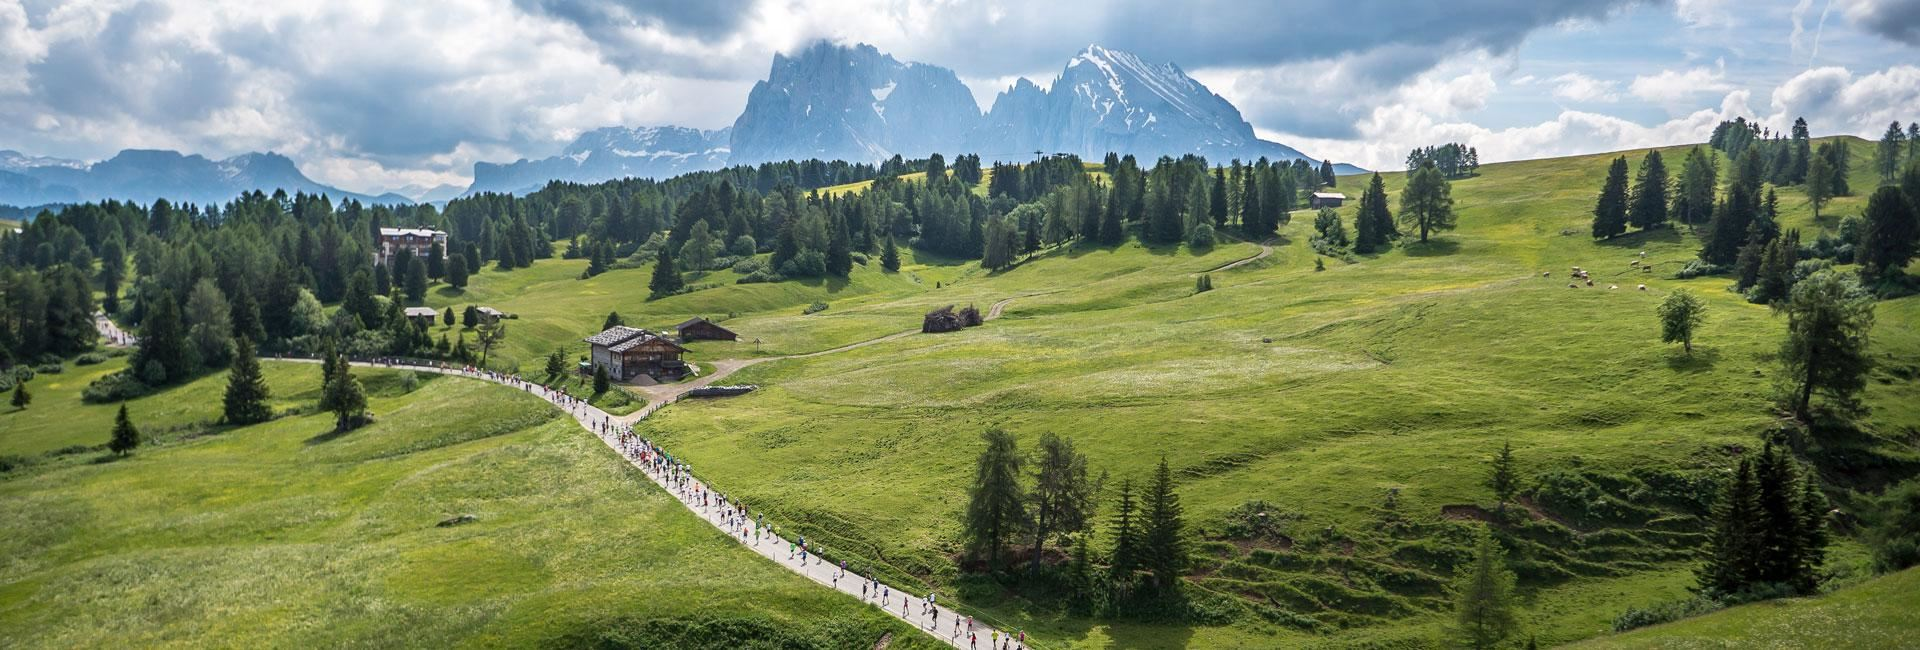 alpe di siusi half marathon in the dolomites